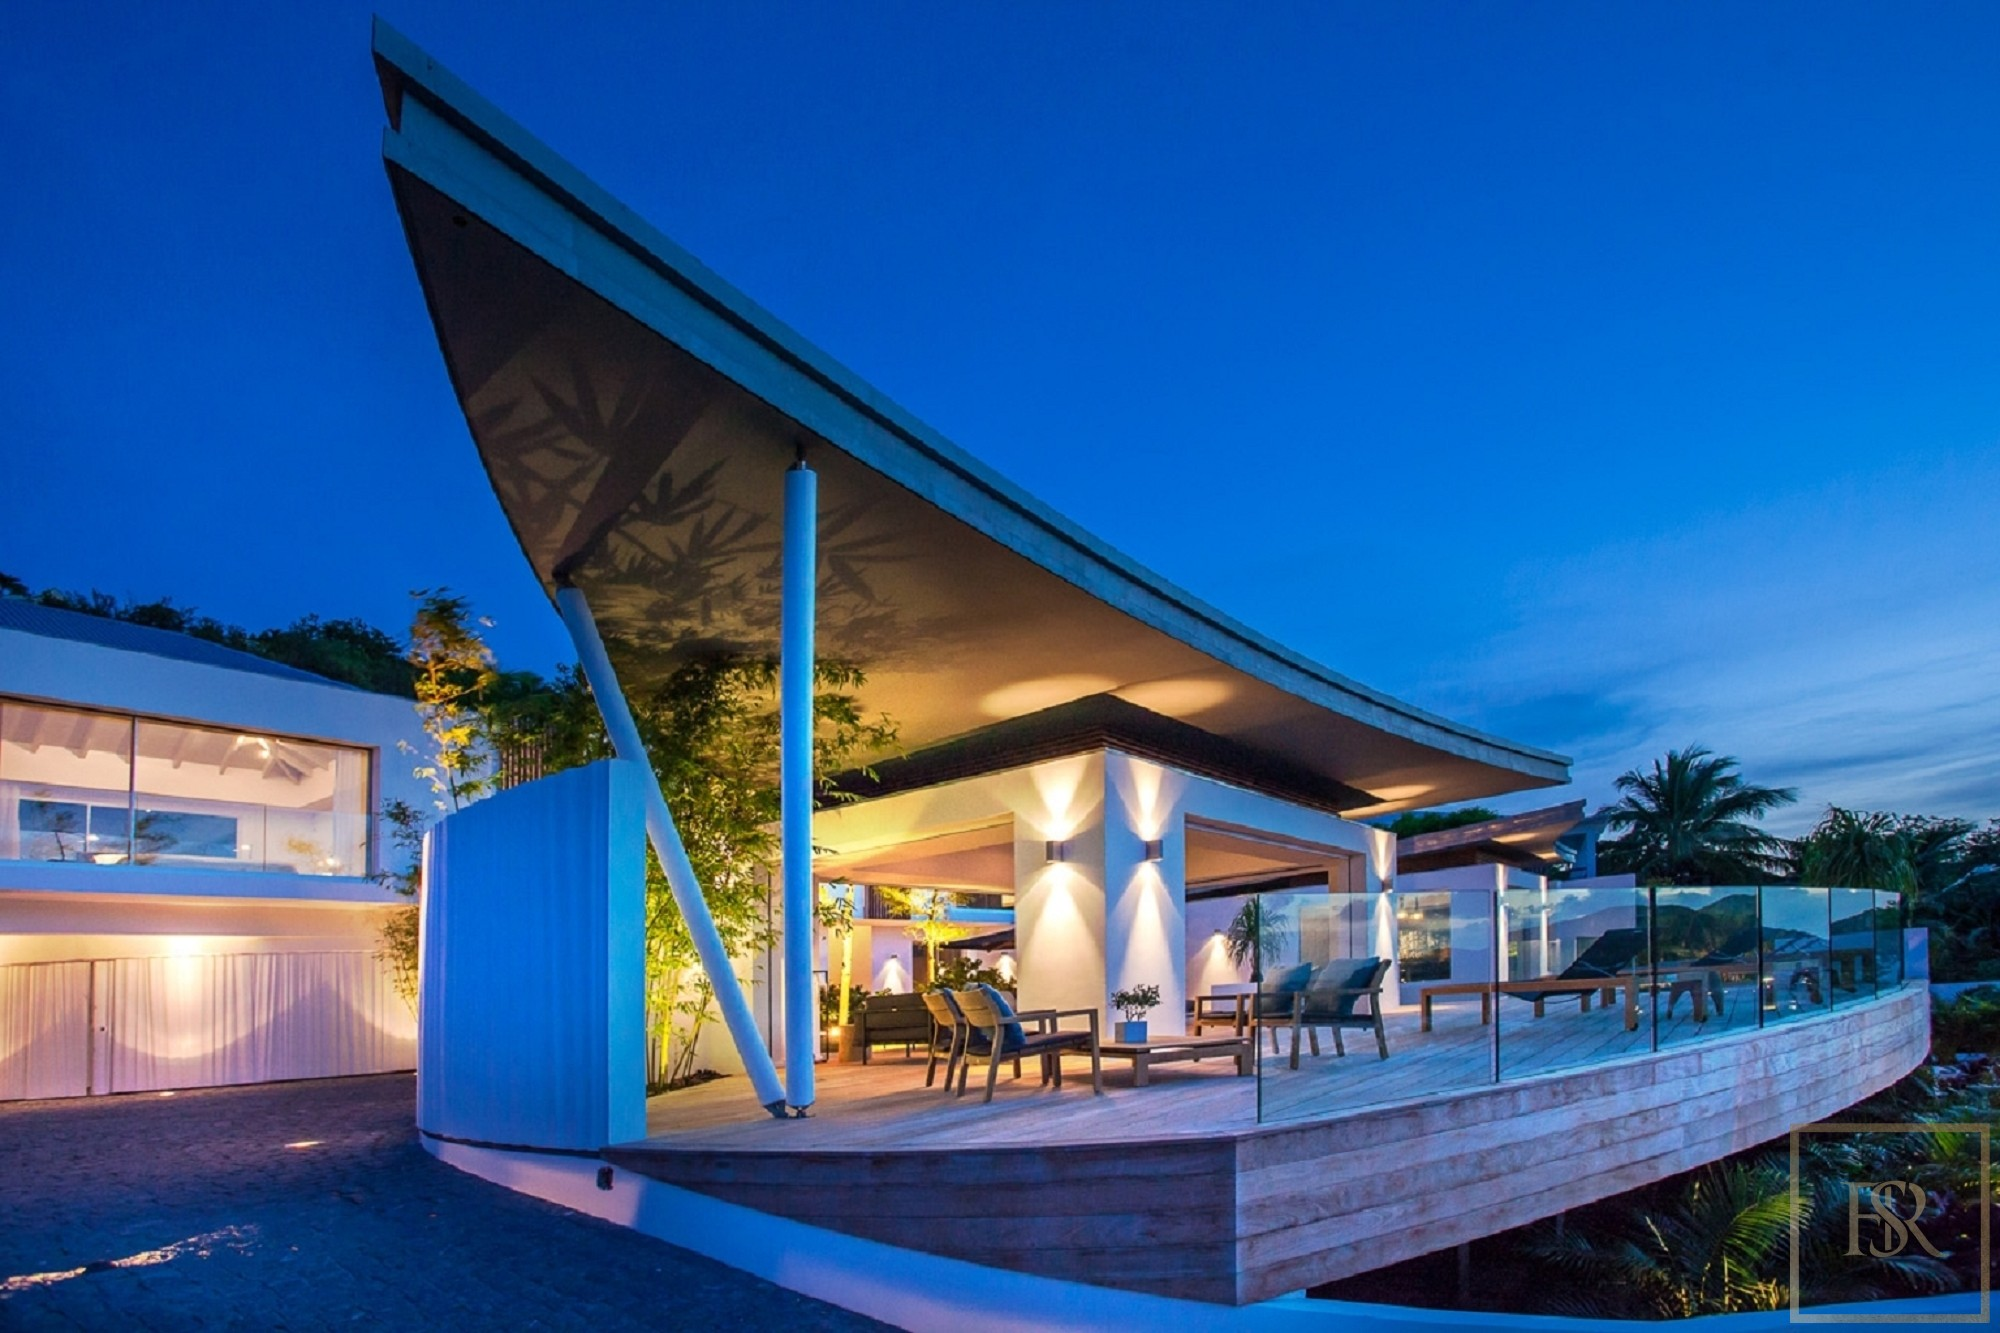 Villa Wings 4 BR - St Jean, St Barth / St Barts rental For Super Rich